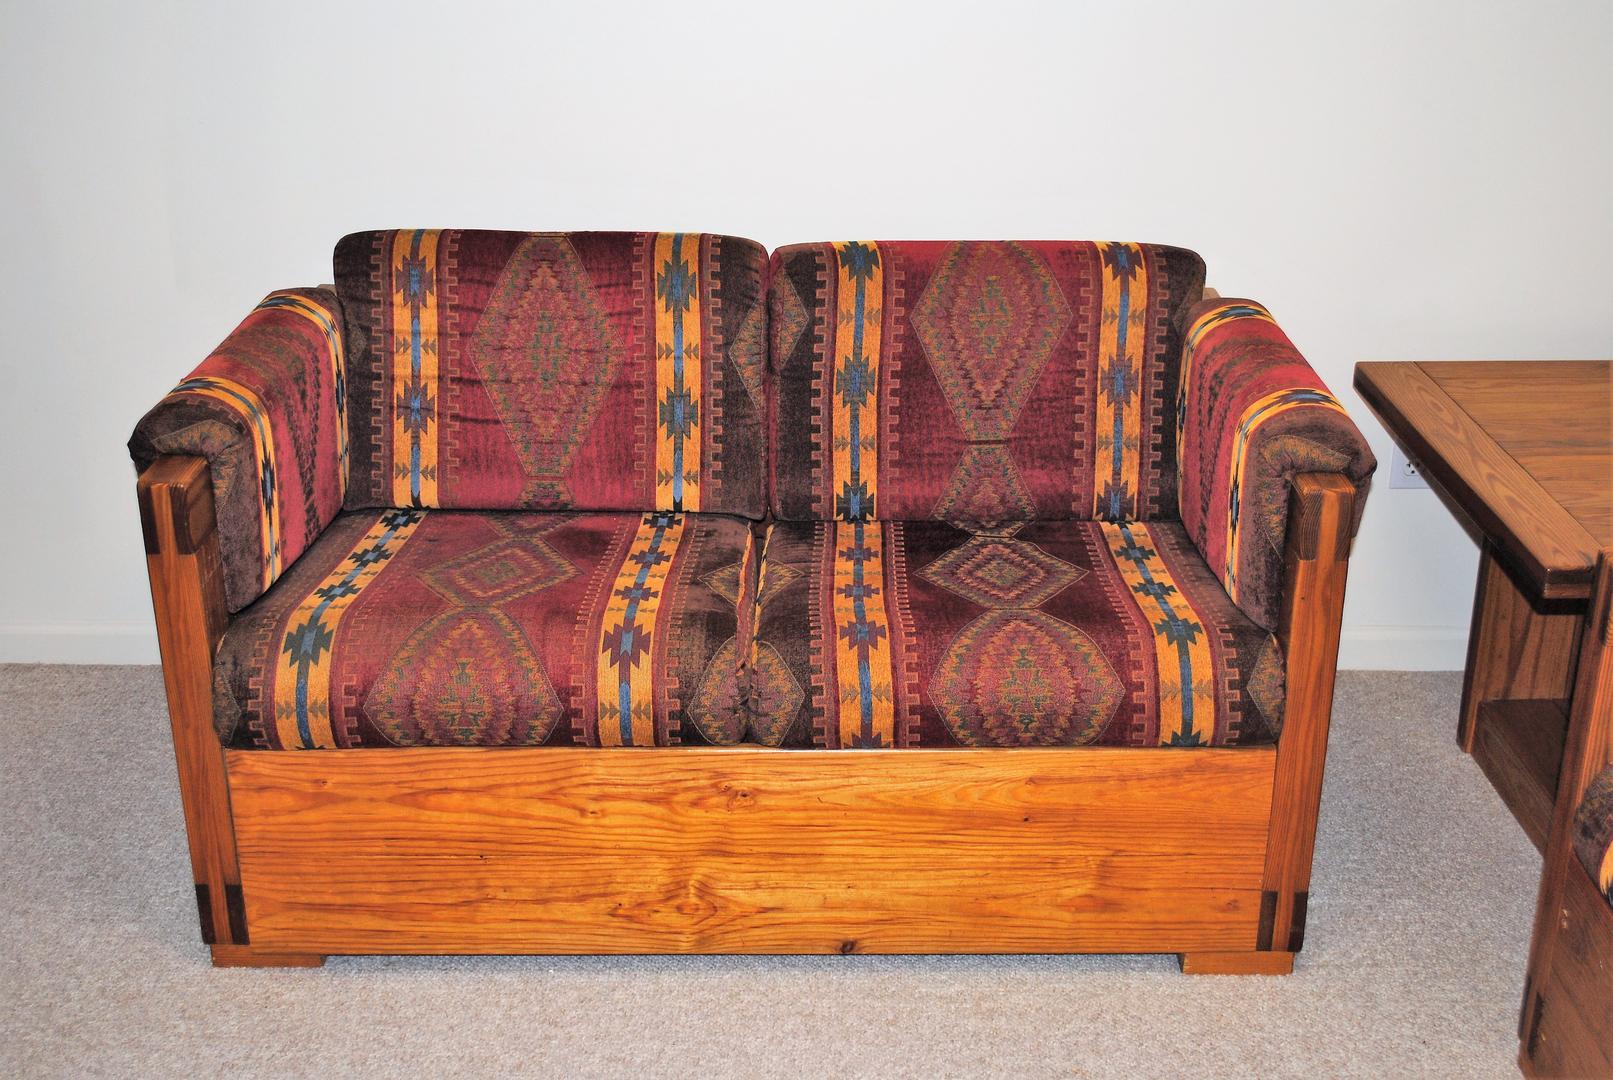 Marvelous This End Up Dresser Kf62 Roccommunity Inzonedesignstudio Interior Chair Design Inzonedesignstudiocom